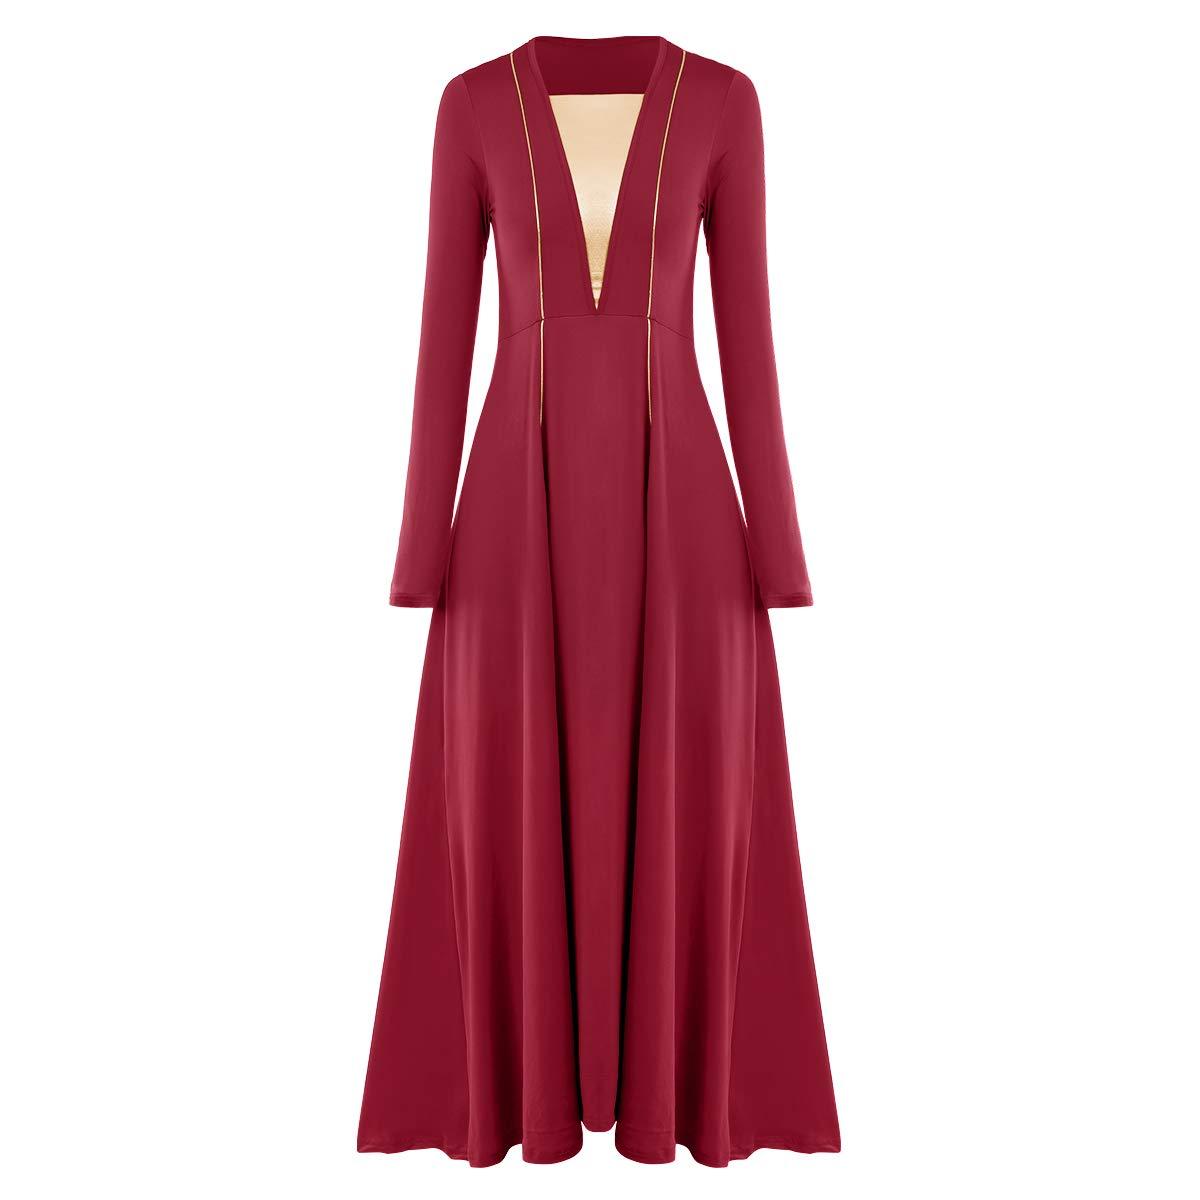 IMEKIS Metallic Liturgical Praise Dance Dress for Women Long Sleeve Lyrical Dancewear Circle Full Length Robe Worship Costume